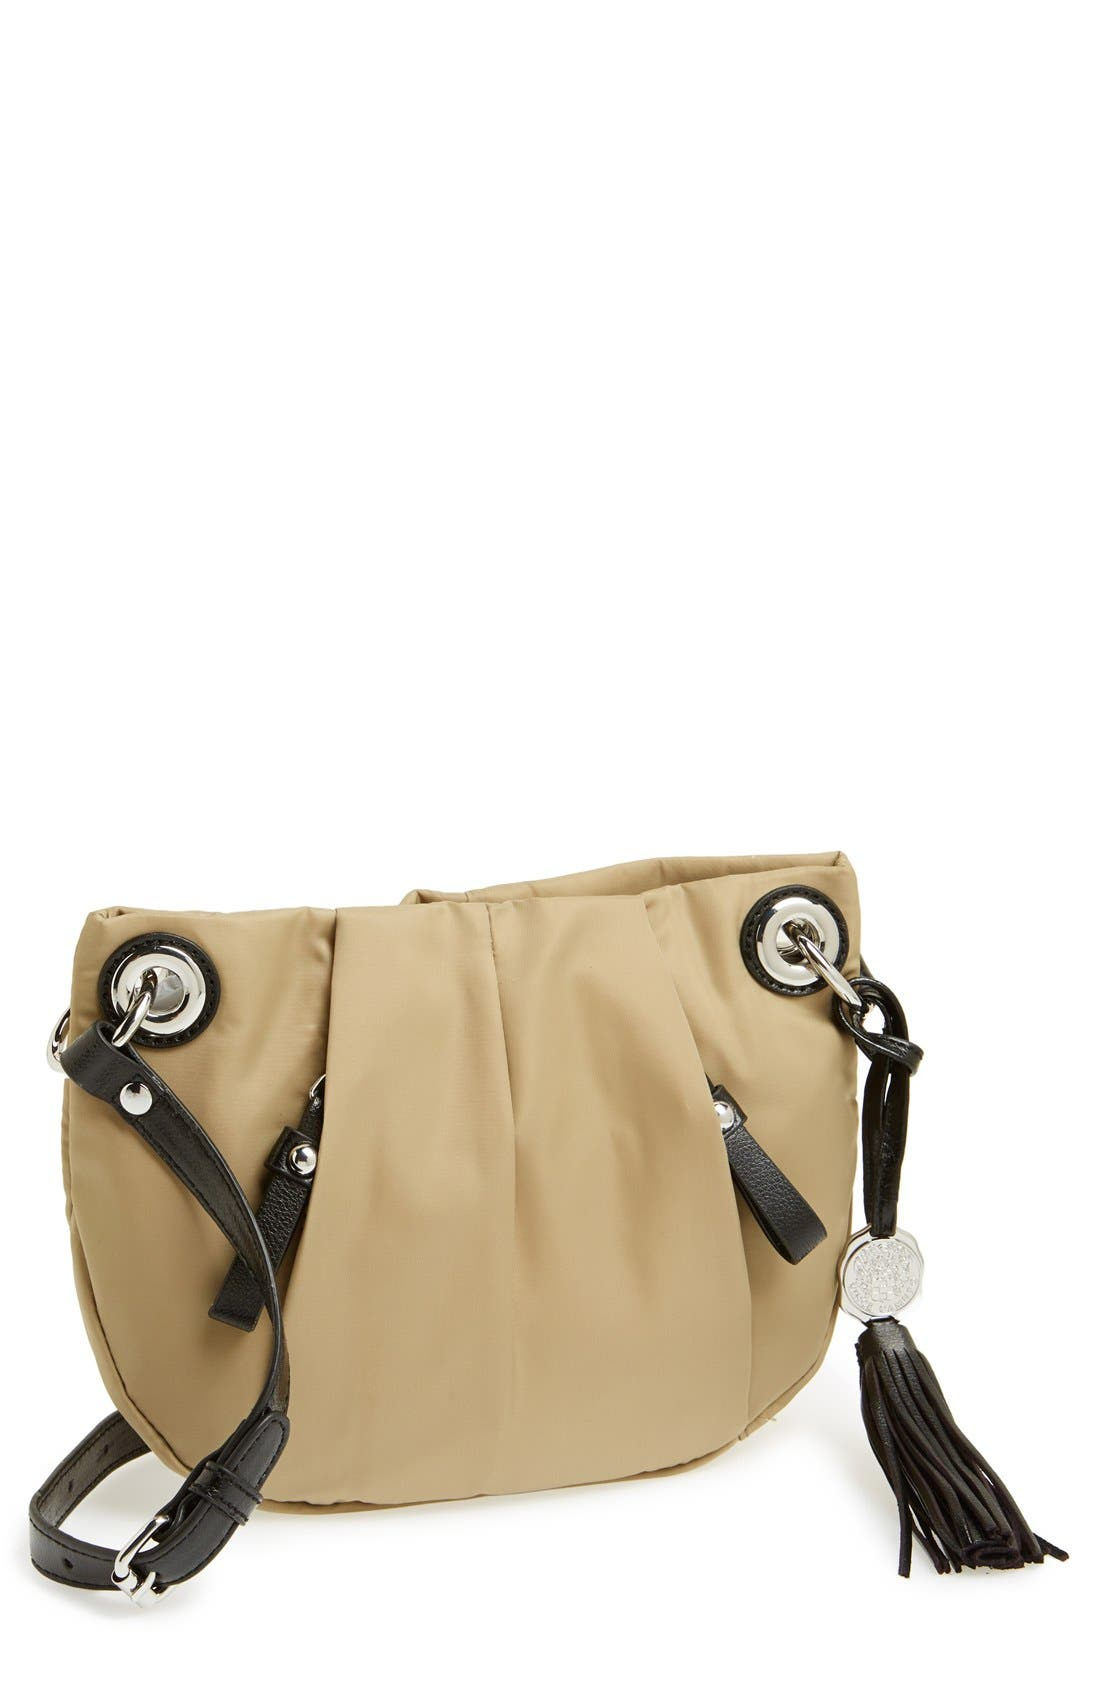 Main Image - Vince Camuto 'Cris' Nylon Crossbody Bag